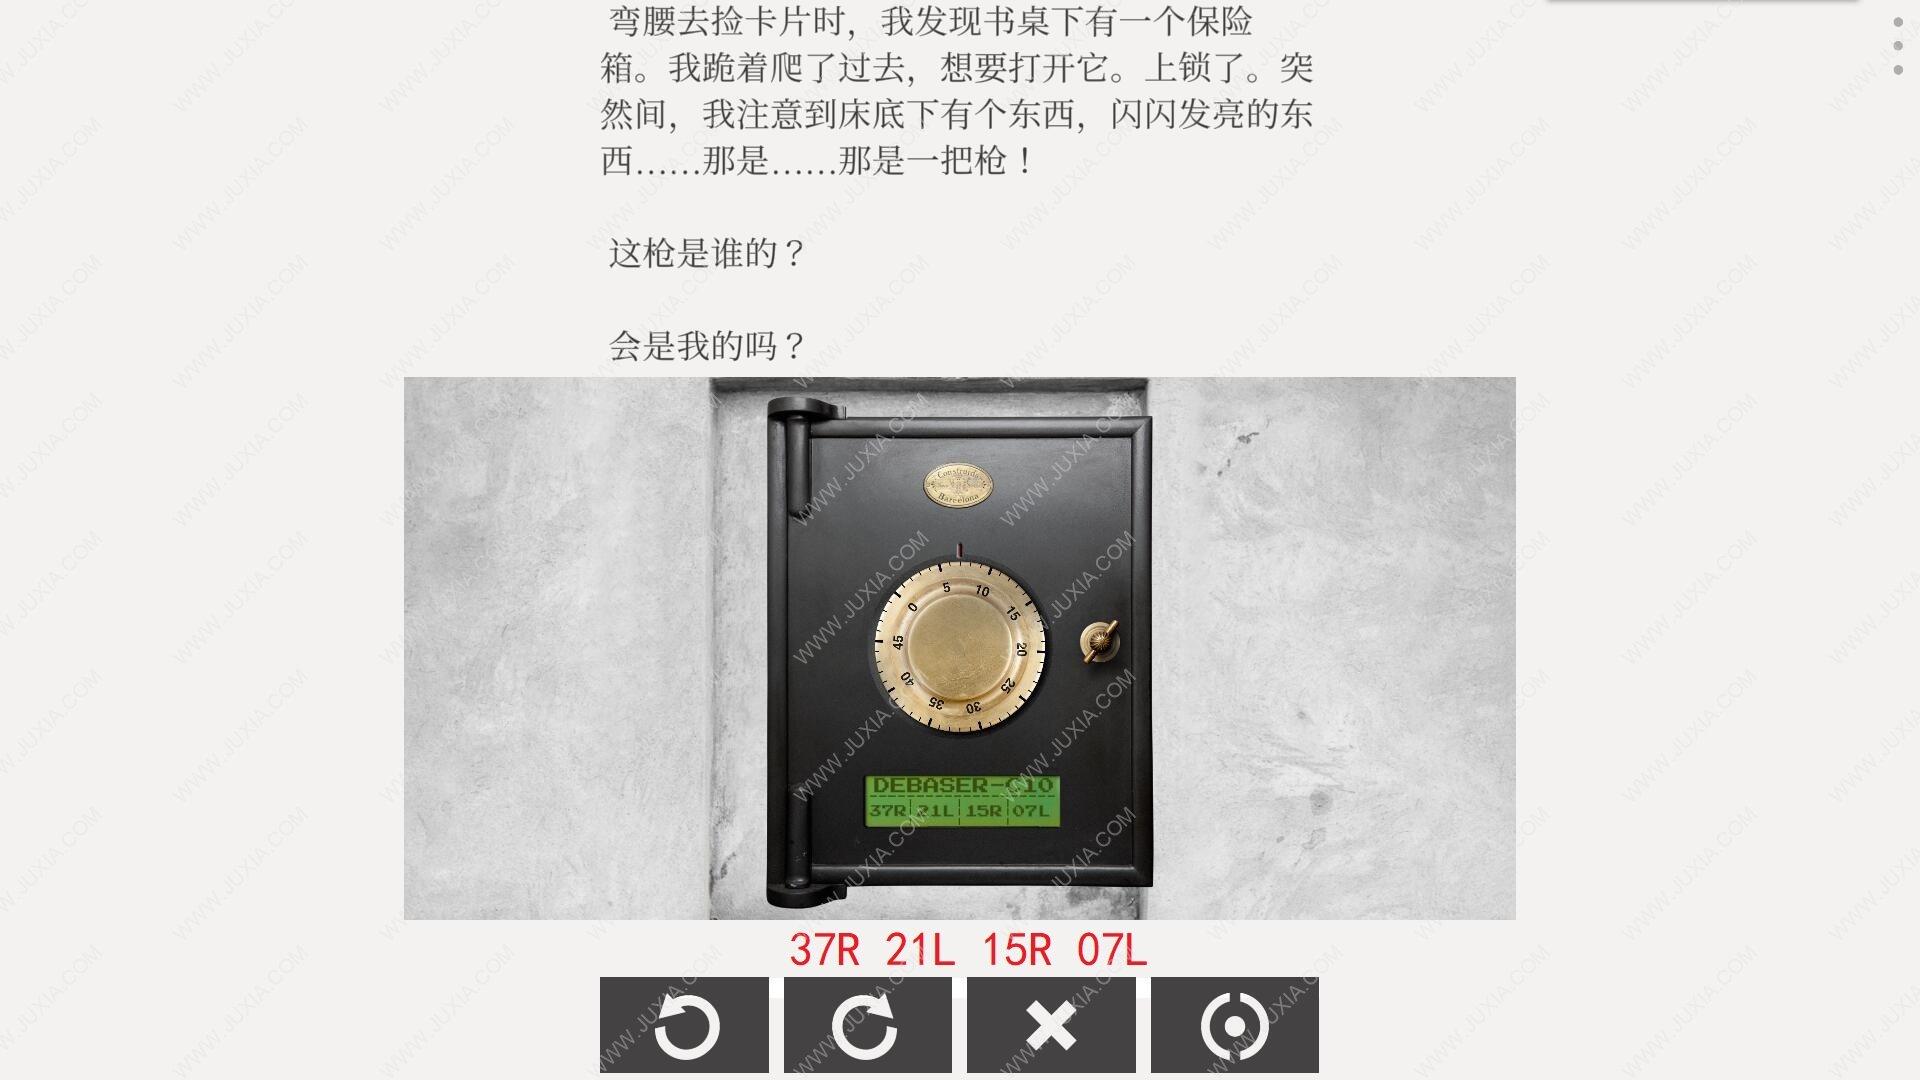 Unmemory第一章攻略保险箱密码 非记忆第一章黑色公文包密码攻略